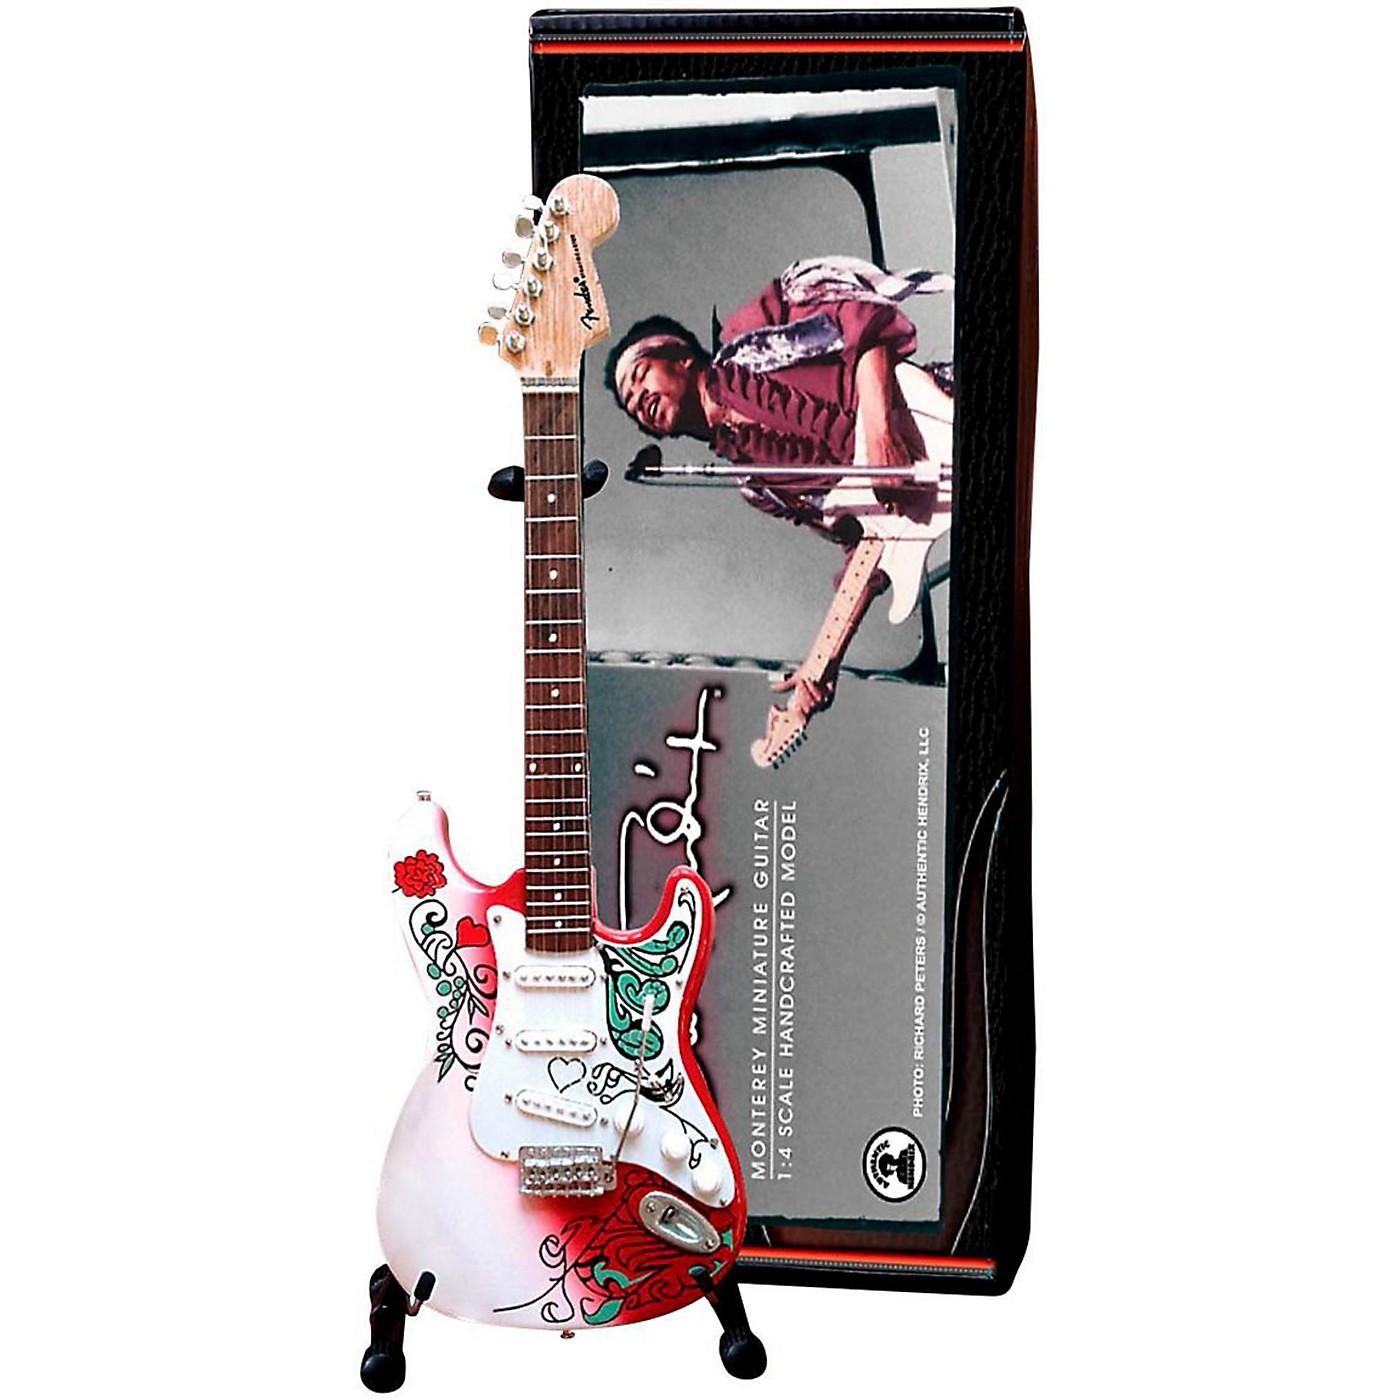 Axe Heaven Jimi Hendrix Monterey Fender Stratocaster Miniature Guitar Replica Collectible thumbnail